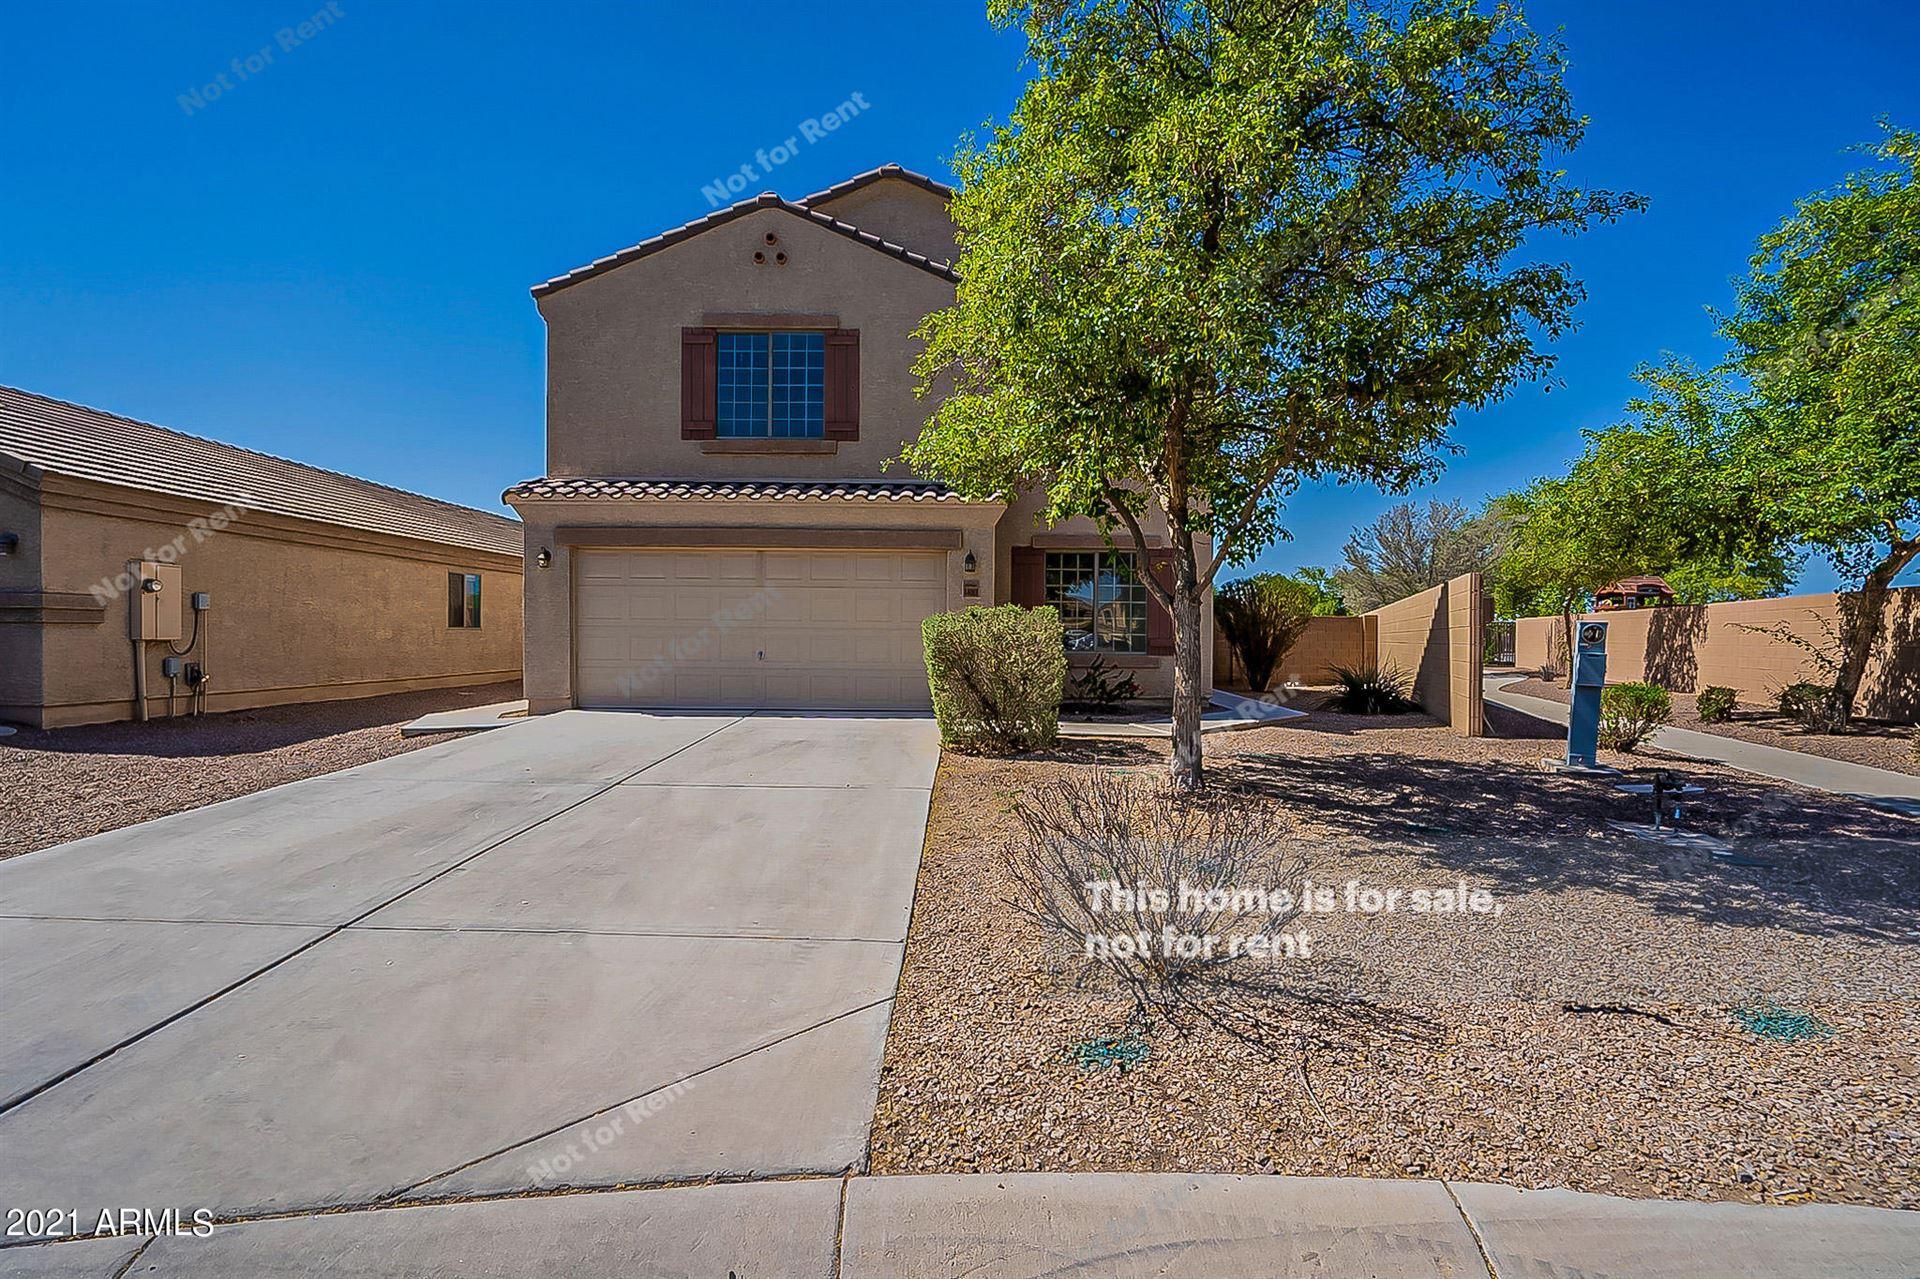 Photo for 44069 W MAGNOLIA Road, Maricopa, AZ 85138 (MLS # 6239063)